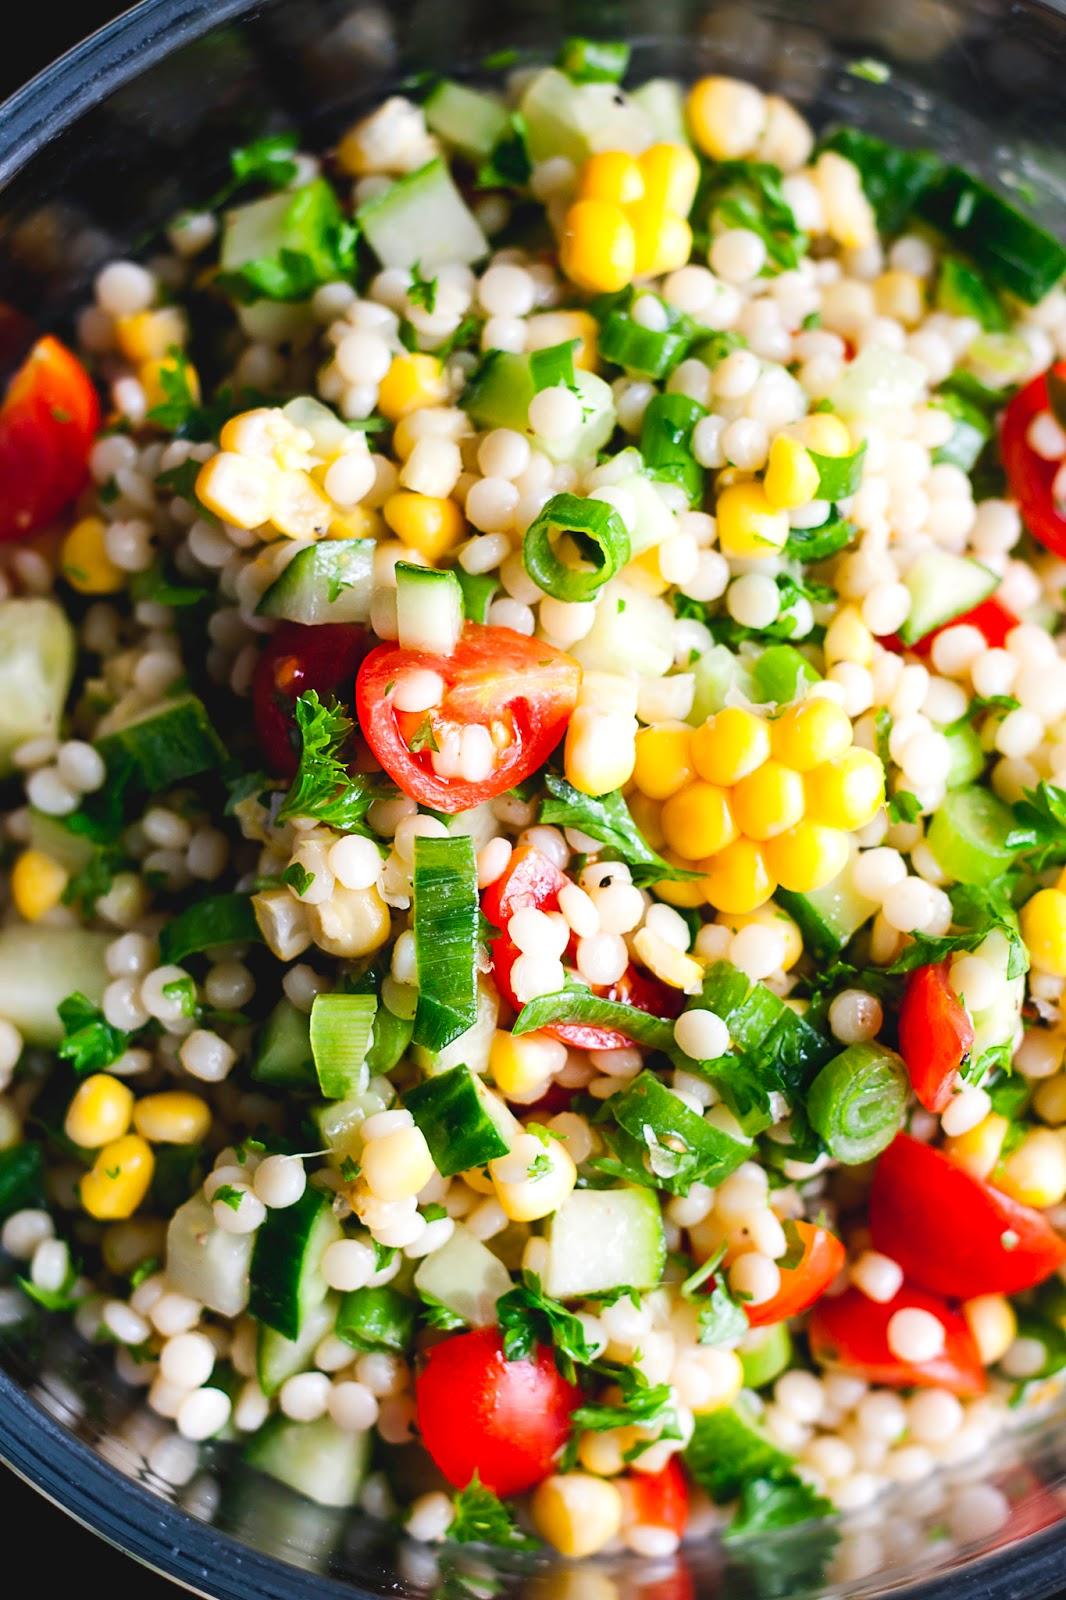 anderledes salat